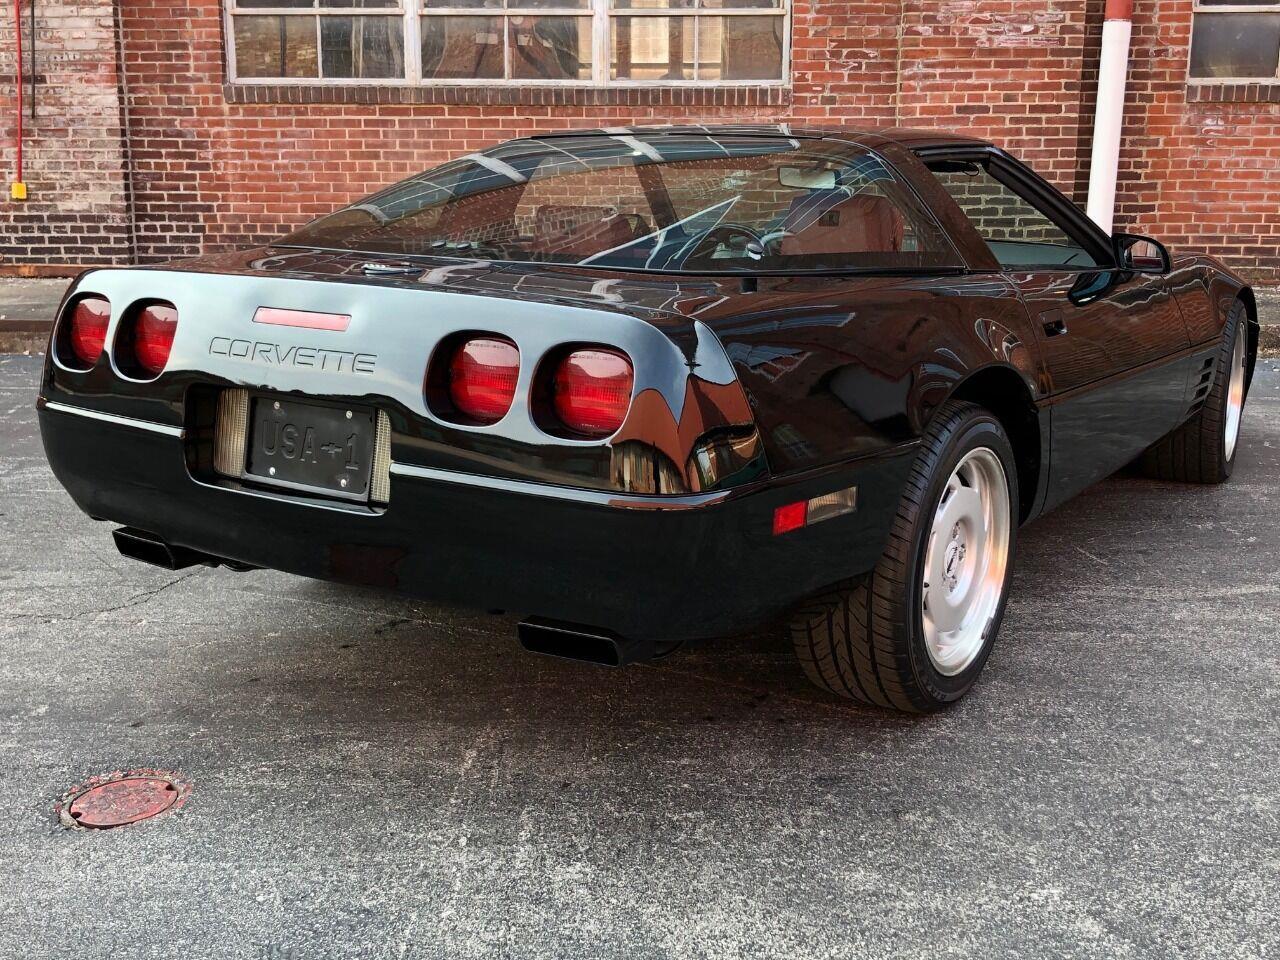 1992 Chevrolet Corvette (CC-1417136) for sale in Saint Charles, Missouri